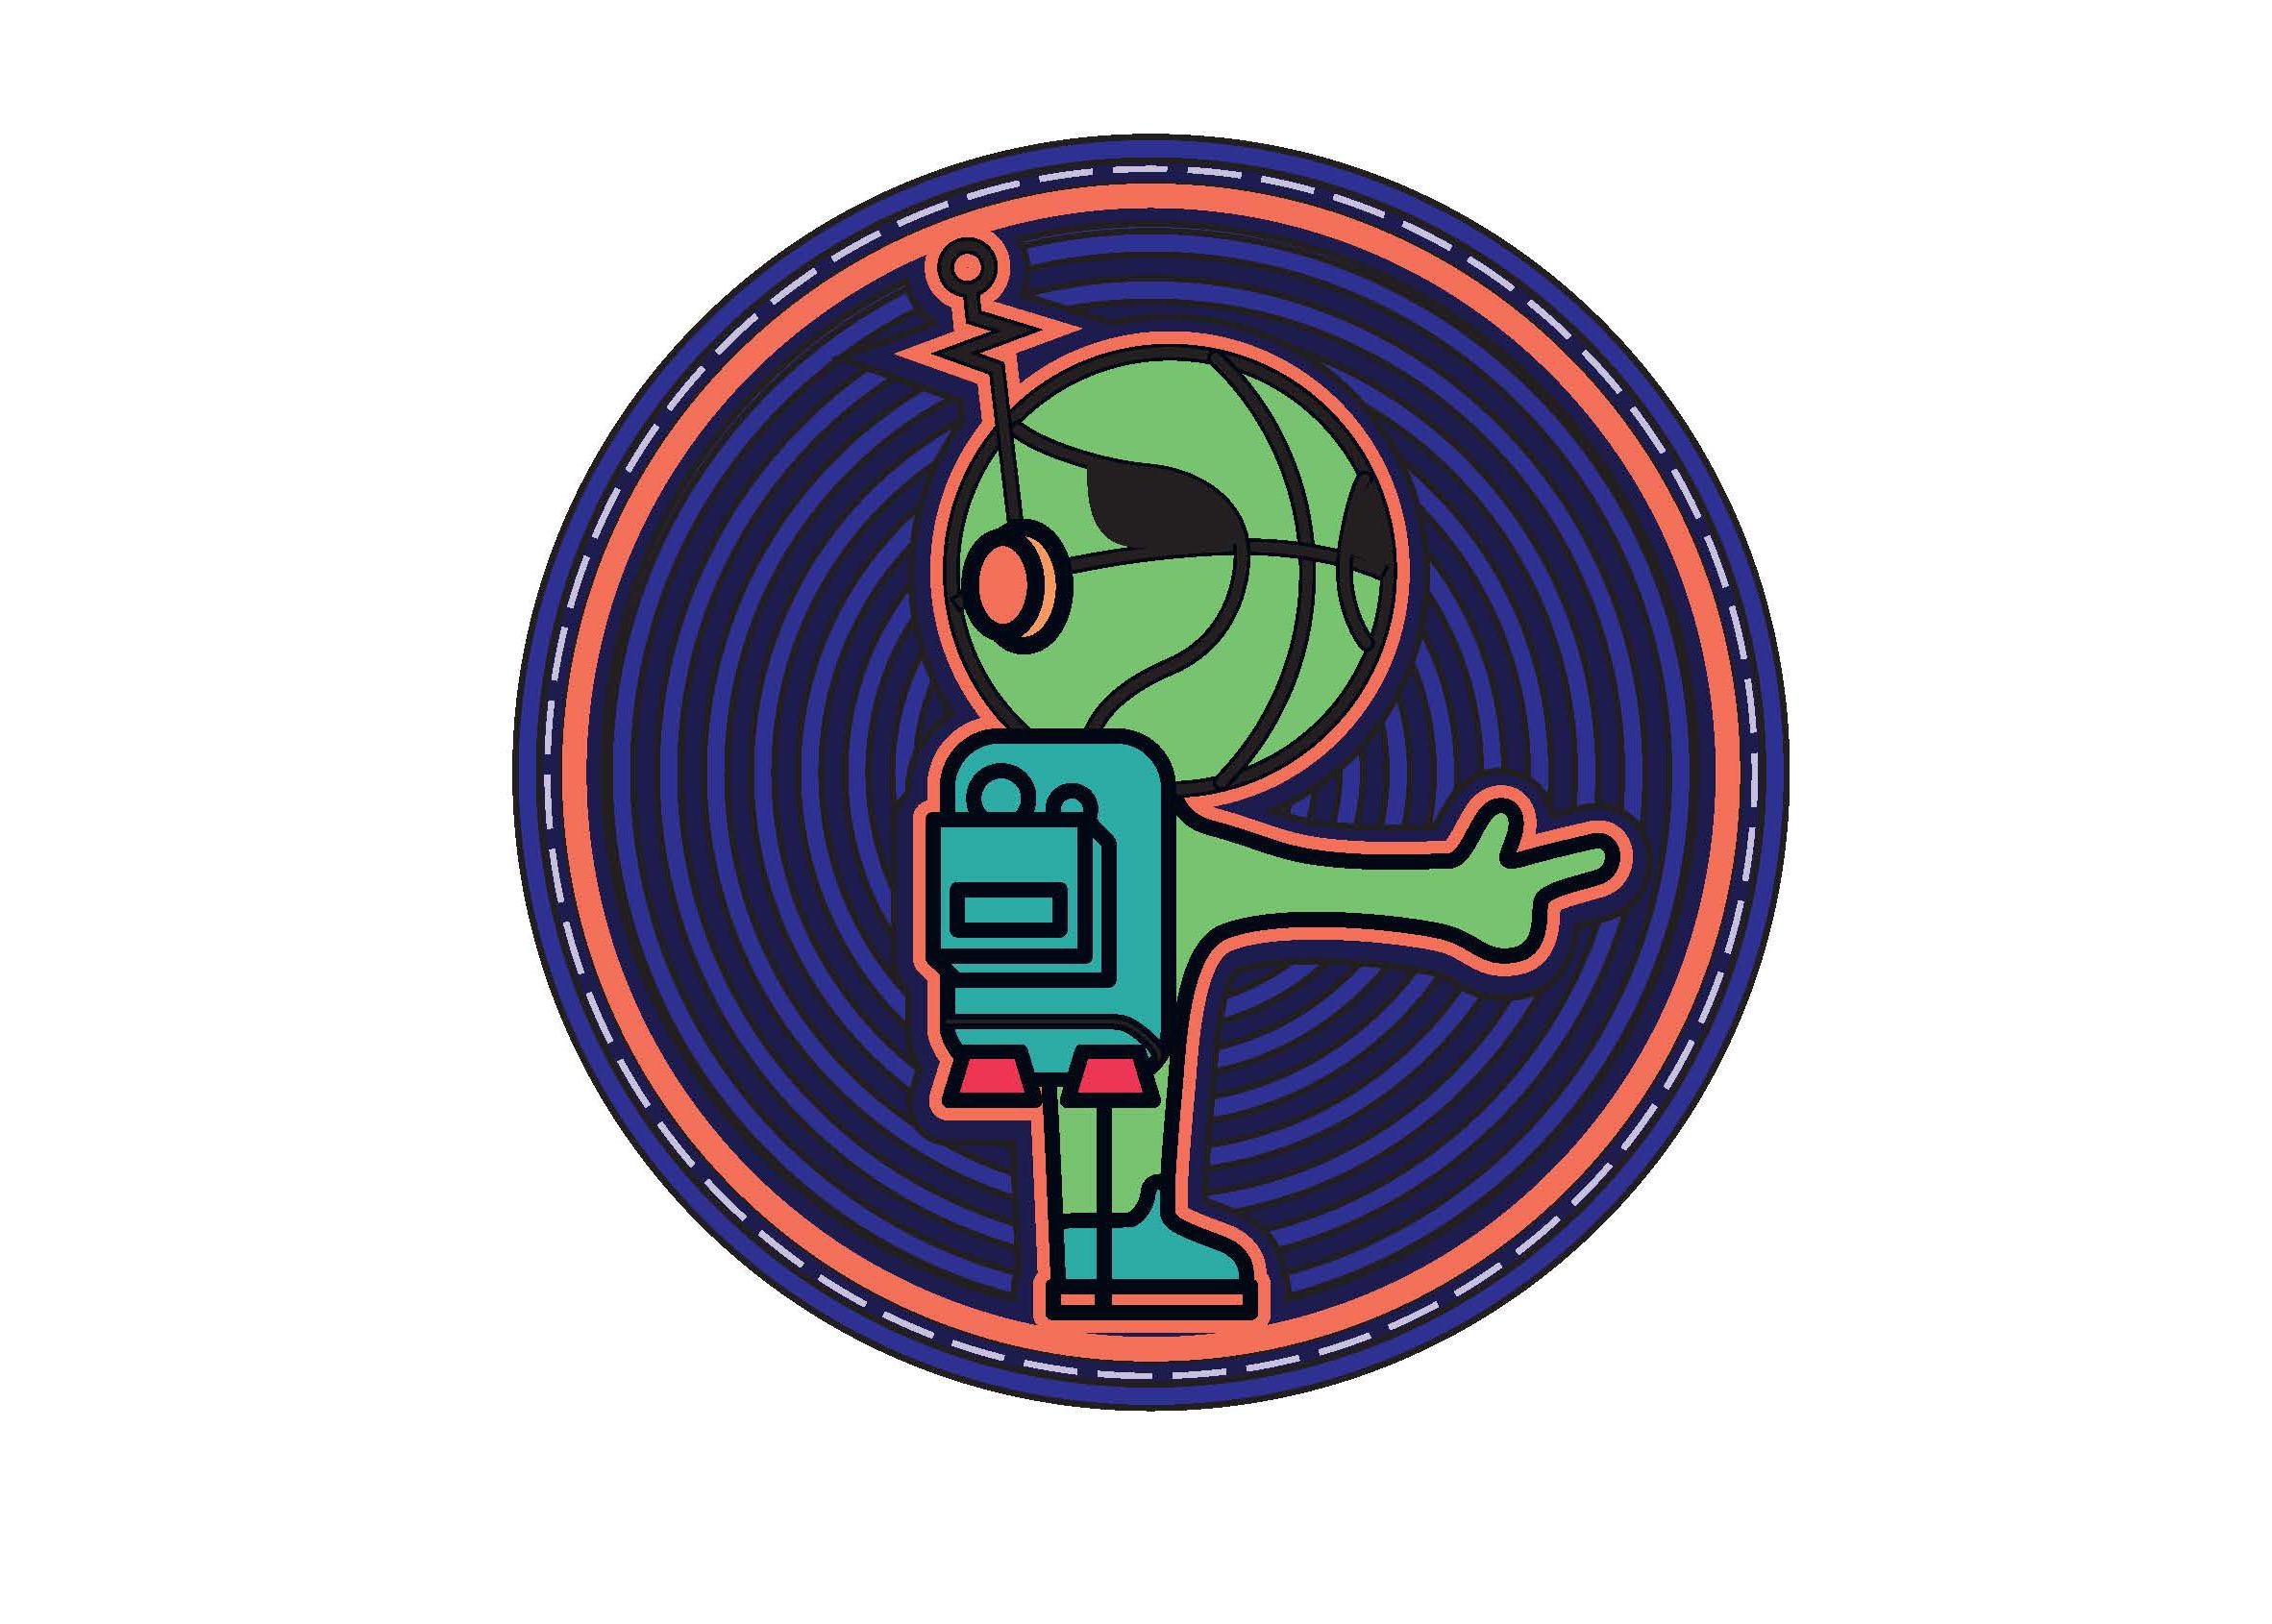 Nike Designer Discusses Remaking Famed Alien Logo Raygun